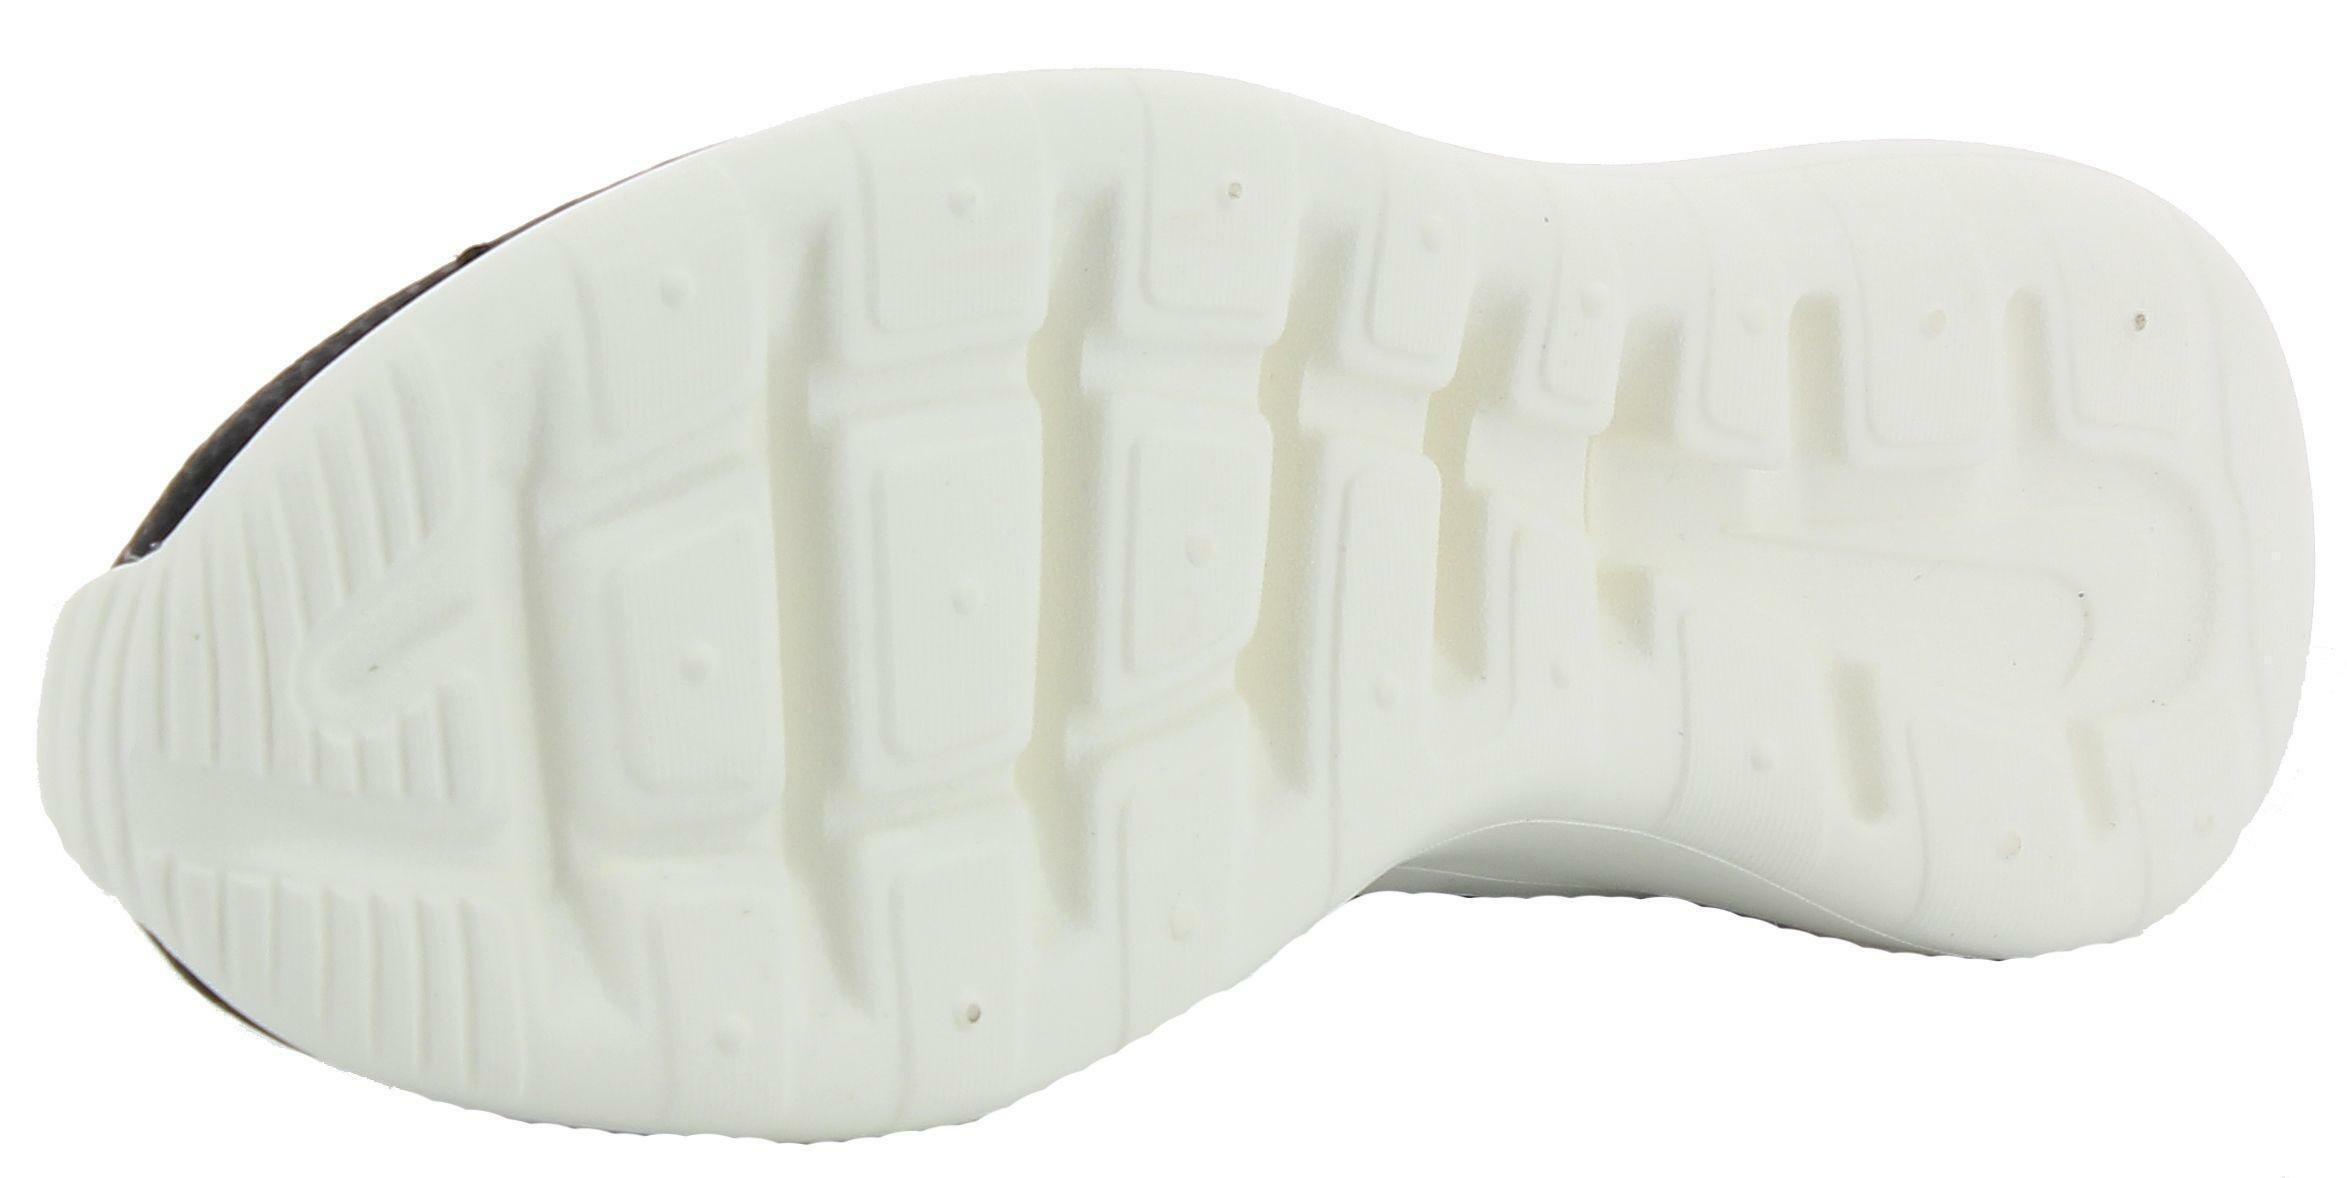 nike nike kaishi 2.0 se scarpe sportive uomo tela nere 844838004